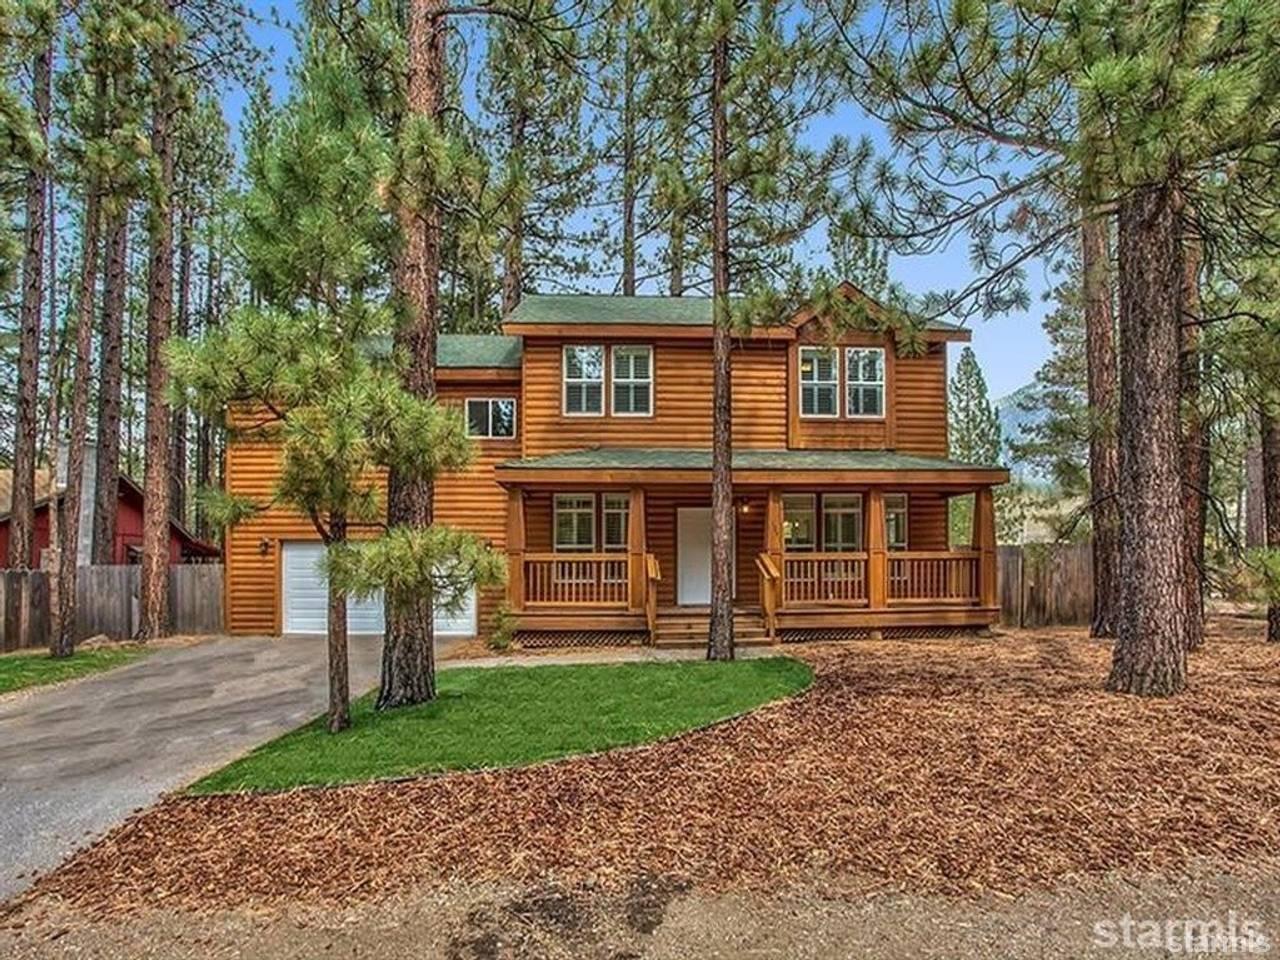 Heather Lake Road, SOUTH LAKE TAHOE, CA 96150